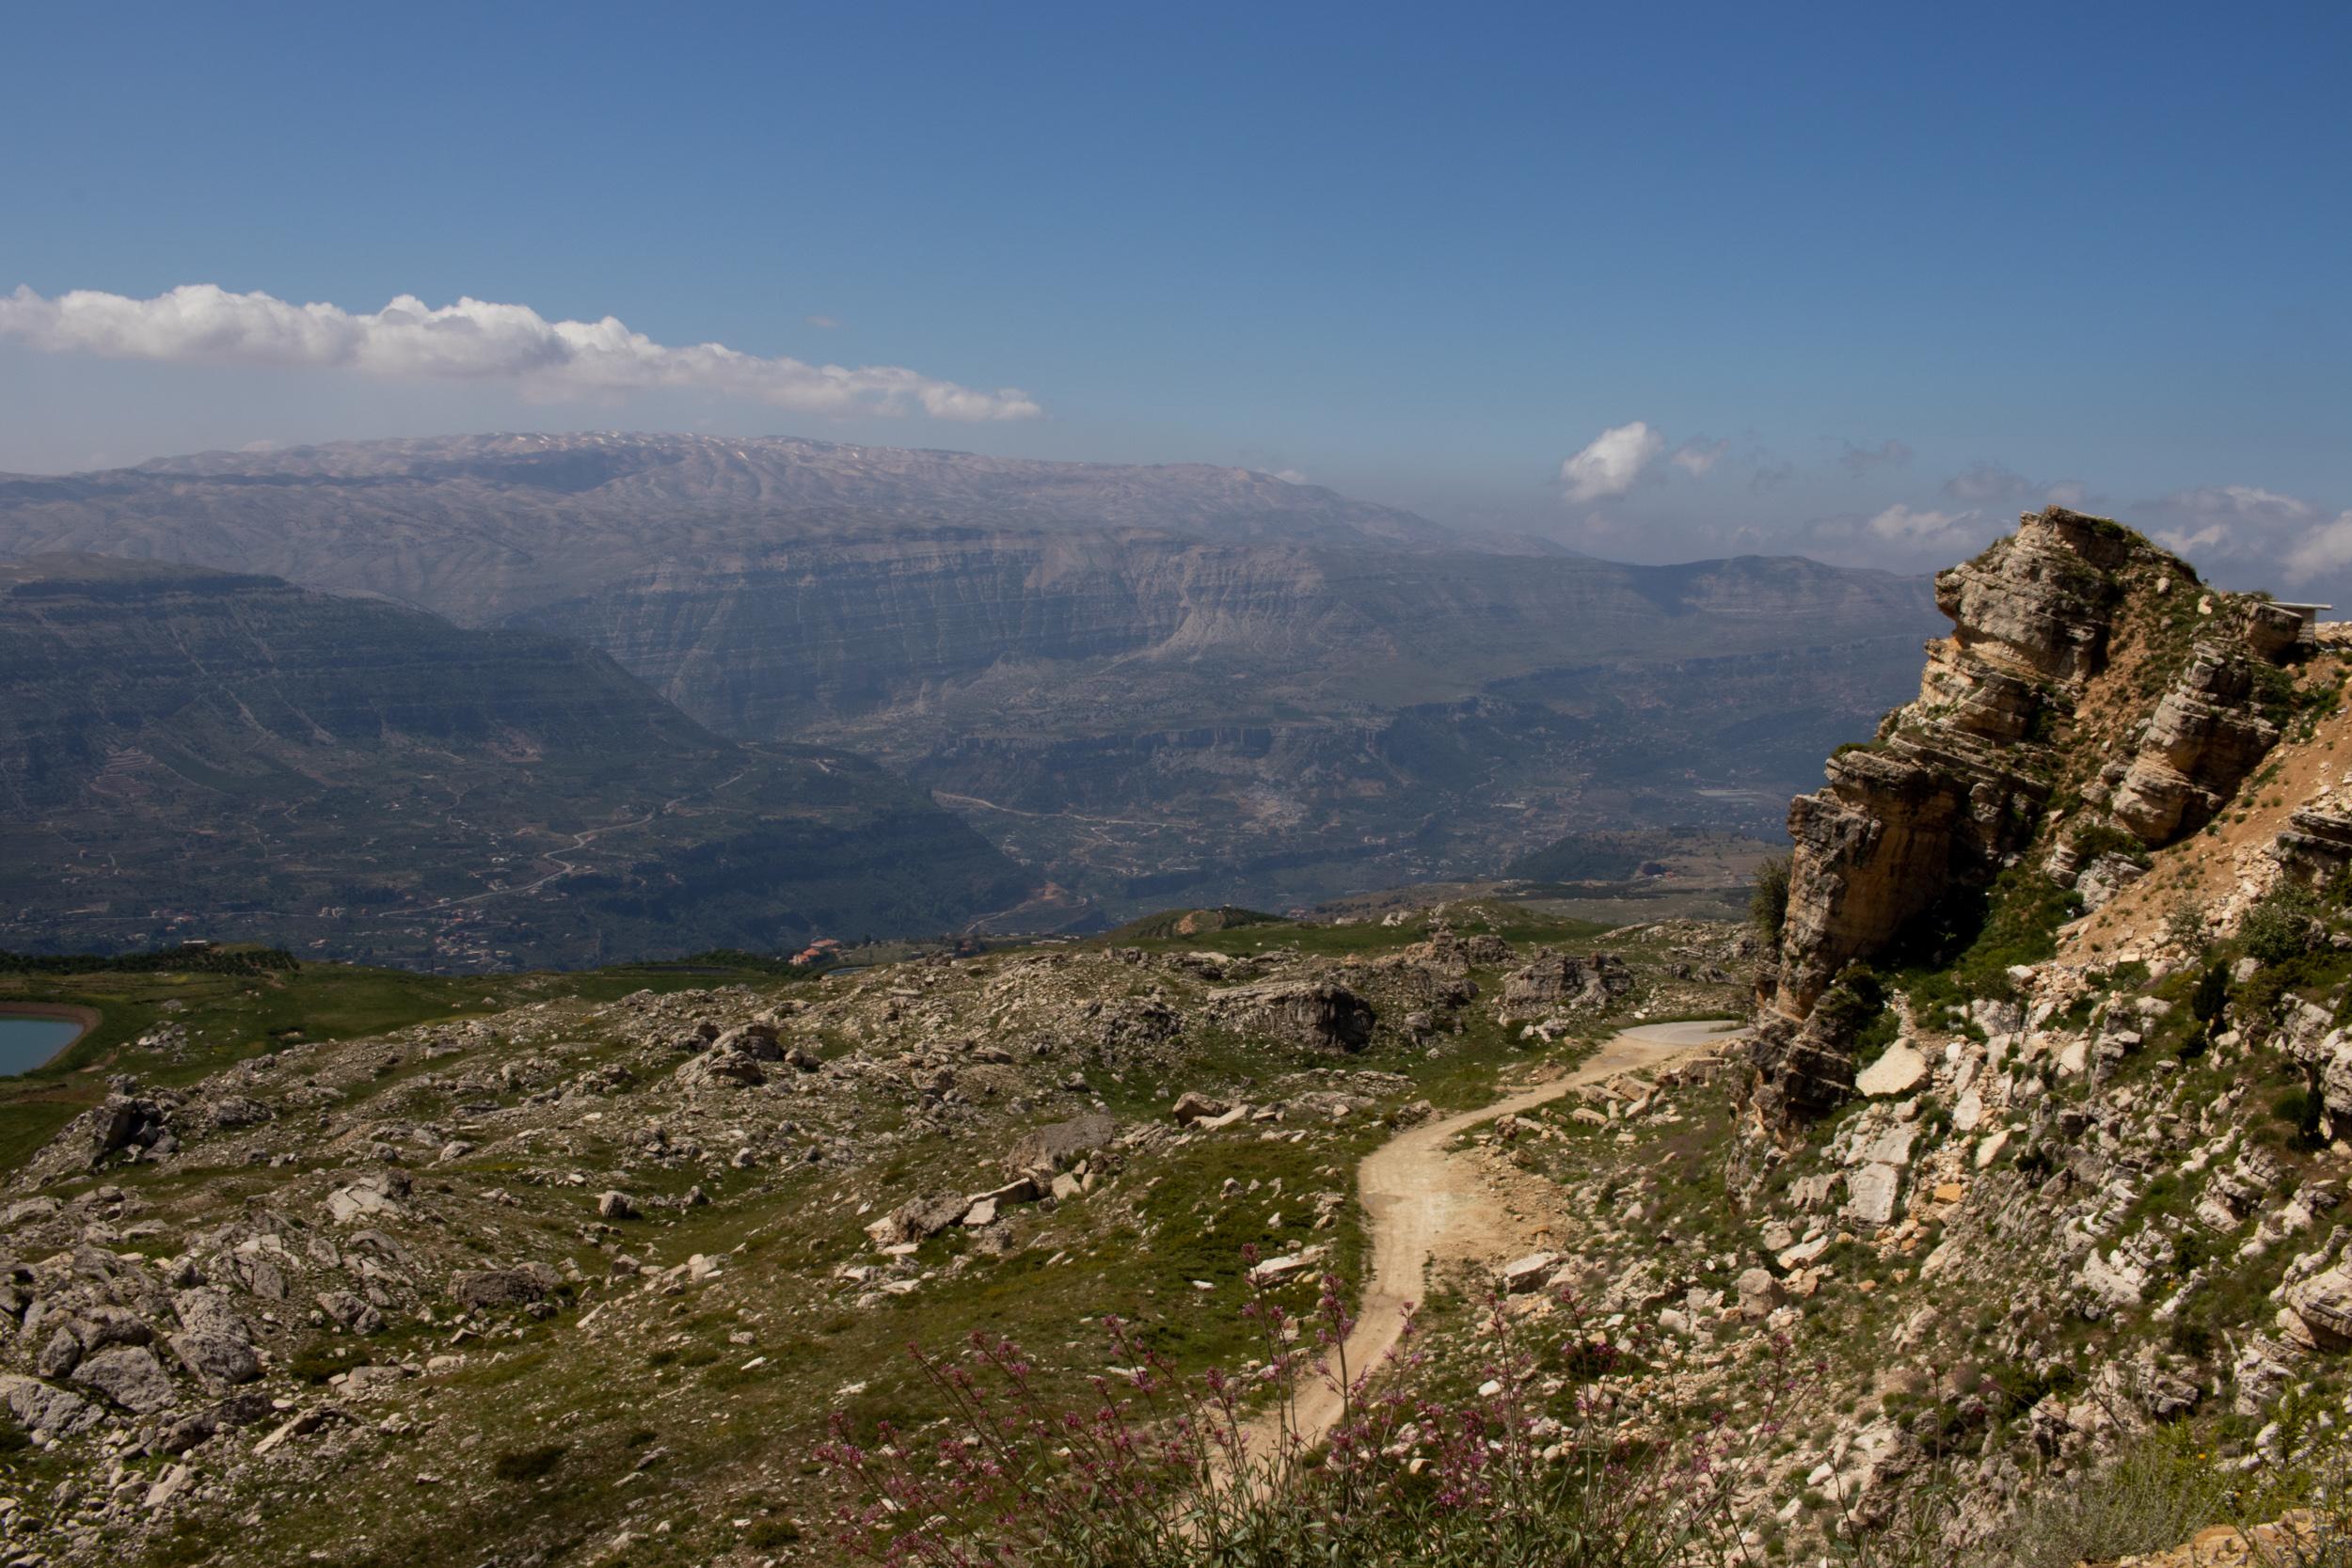 View from Saydet El Arn